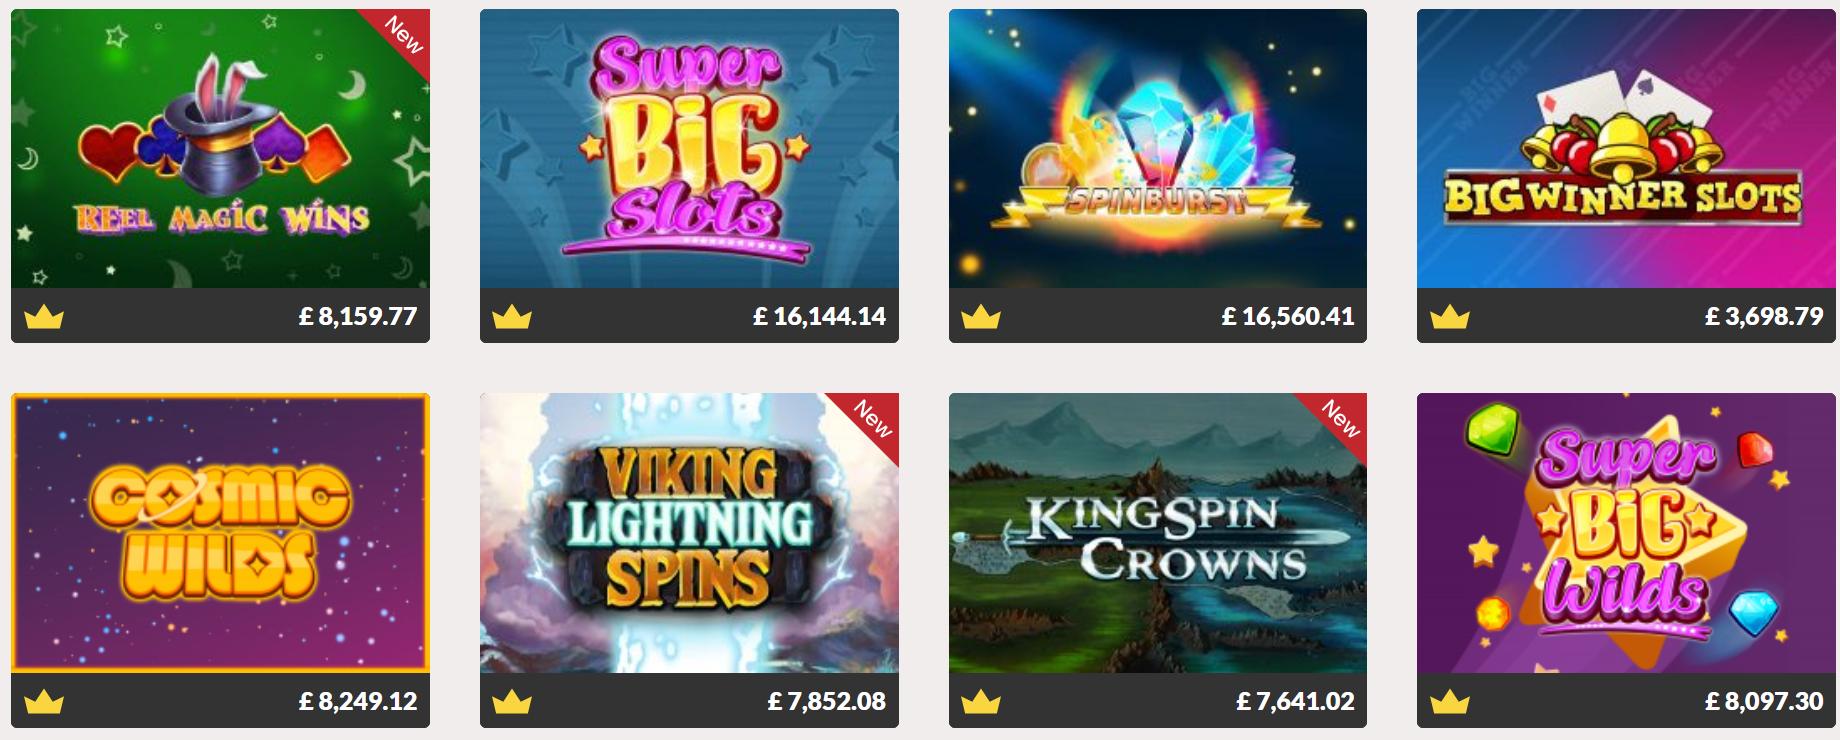 Pocketwin Games